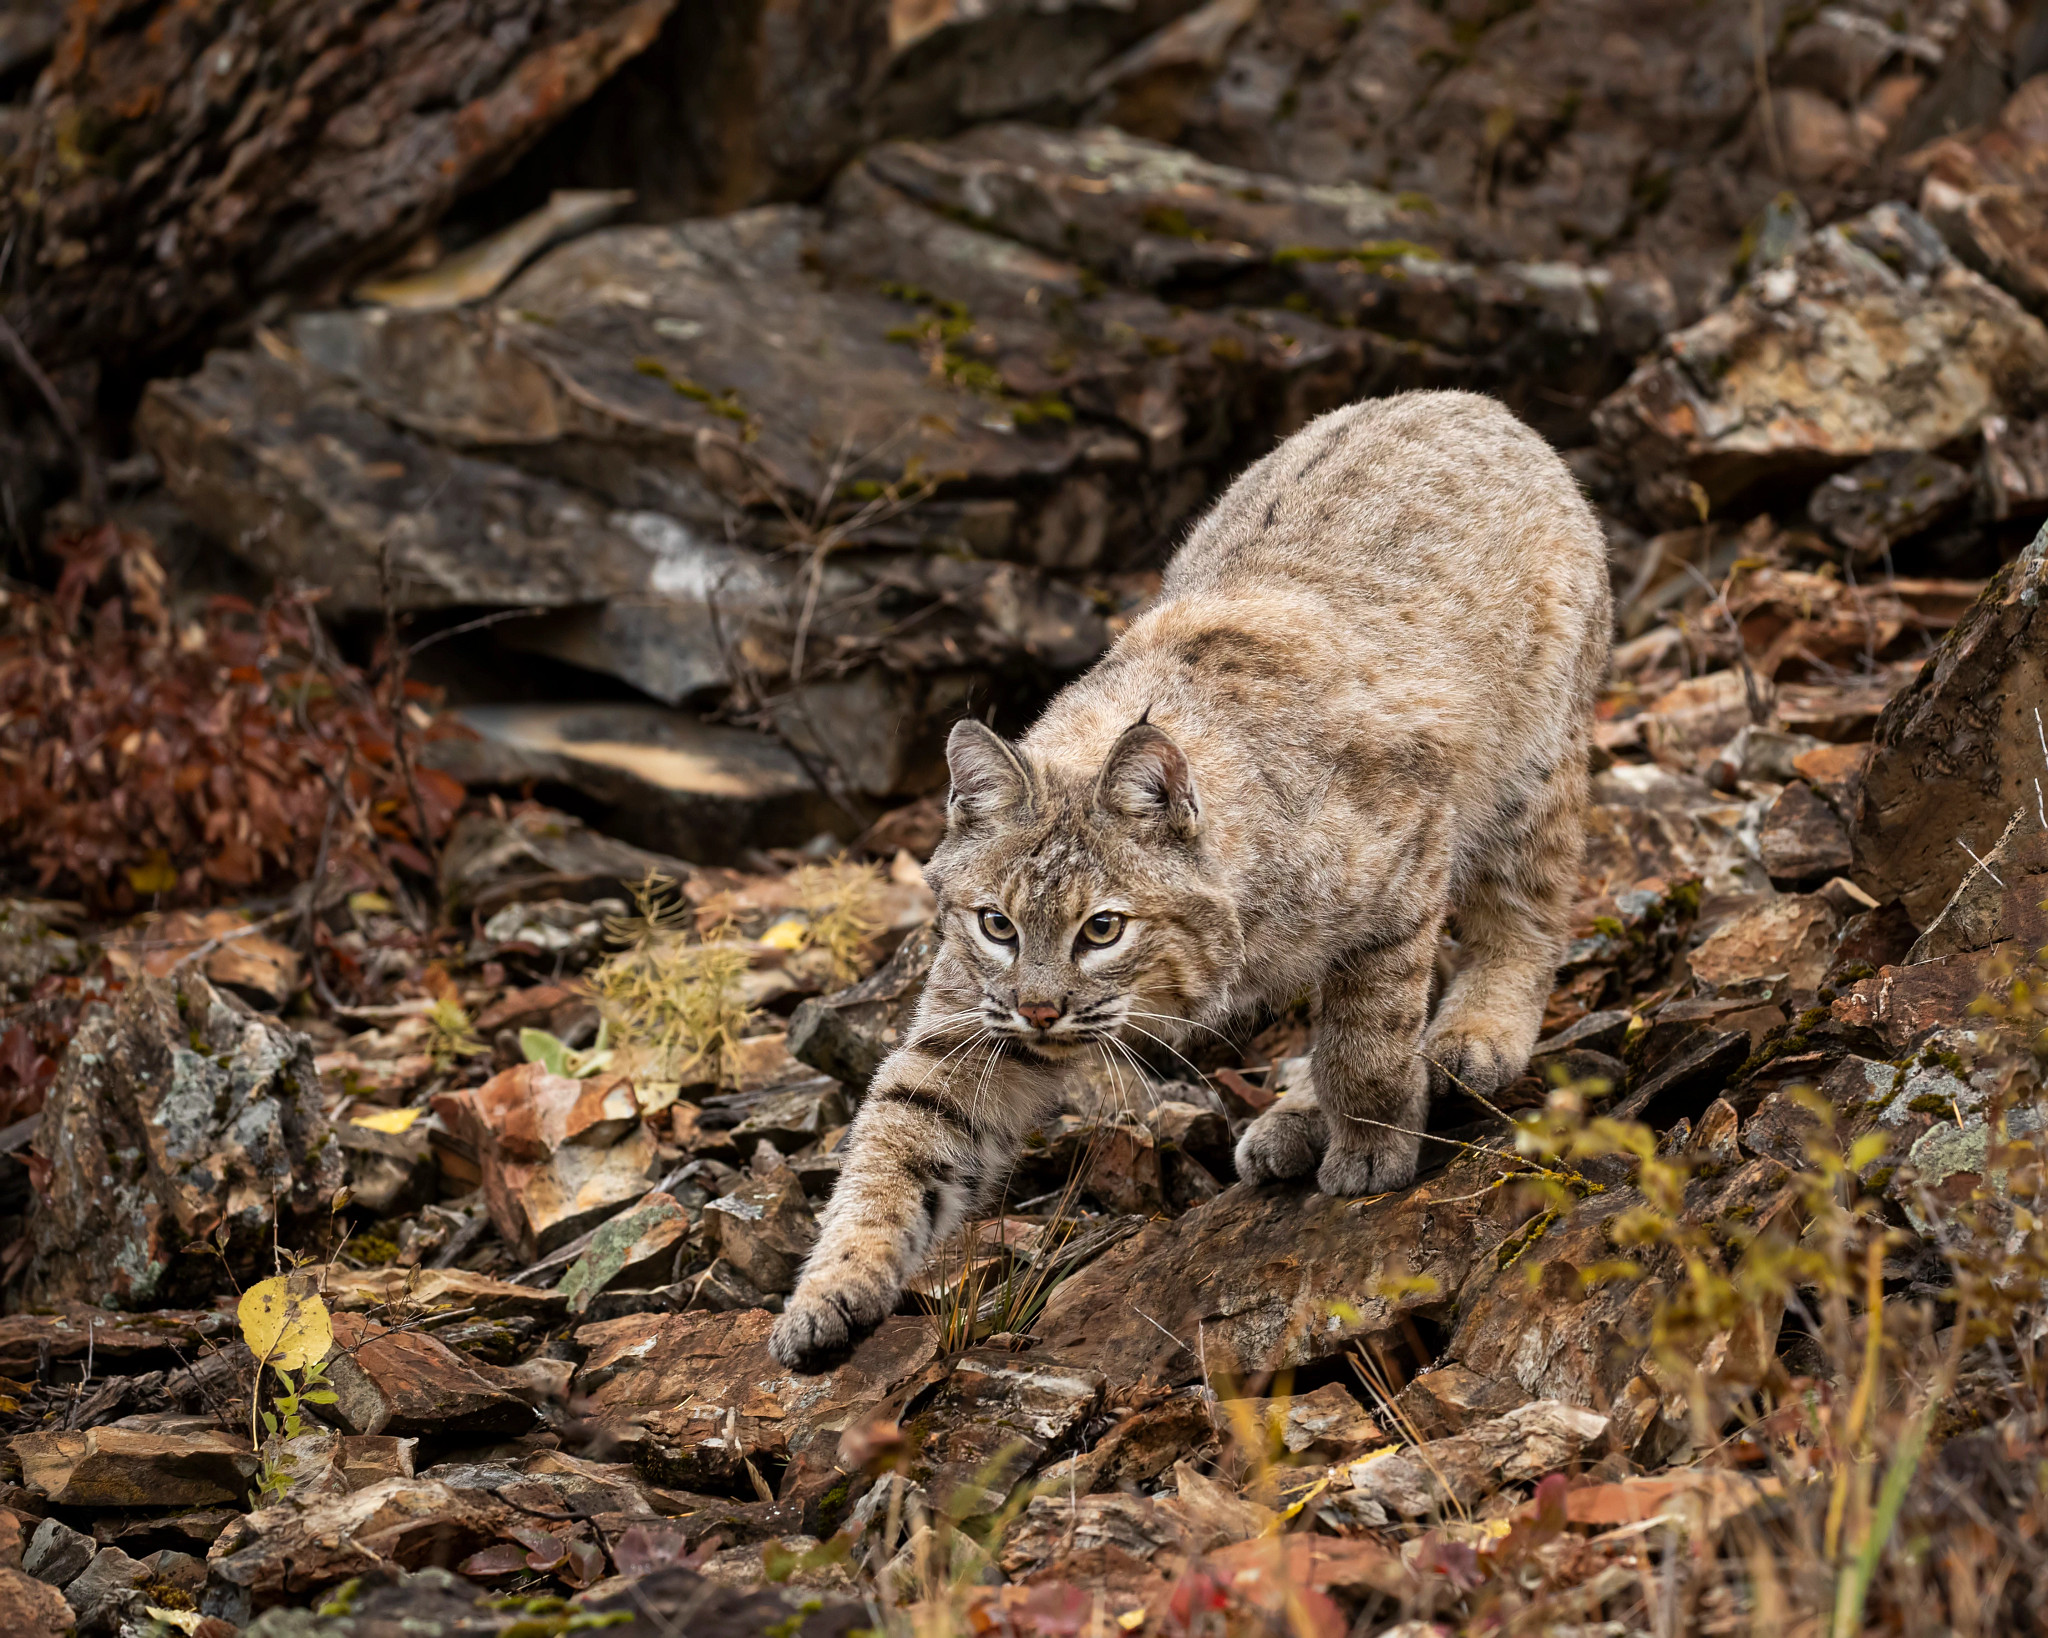 a bobcat stalks in prey in the woods